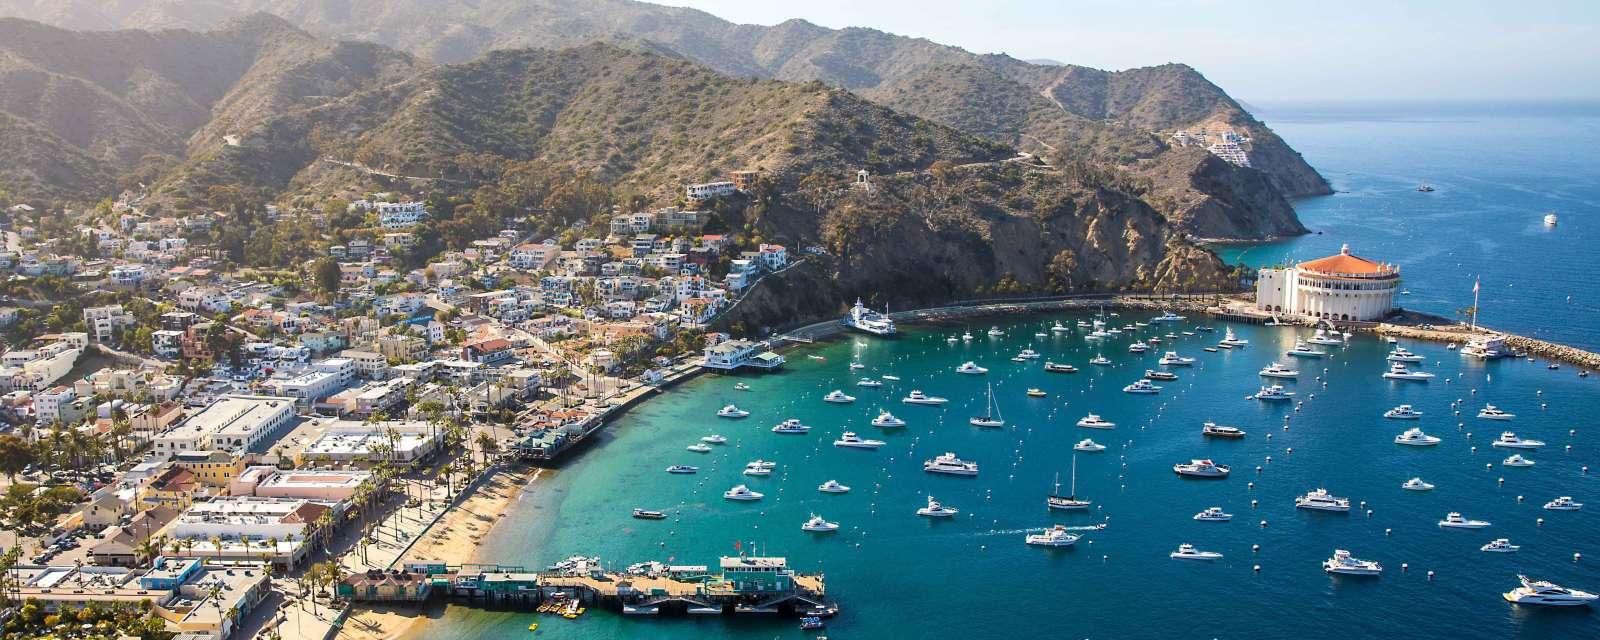 Covid 19 Update Catalina Island Company Operations Status